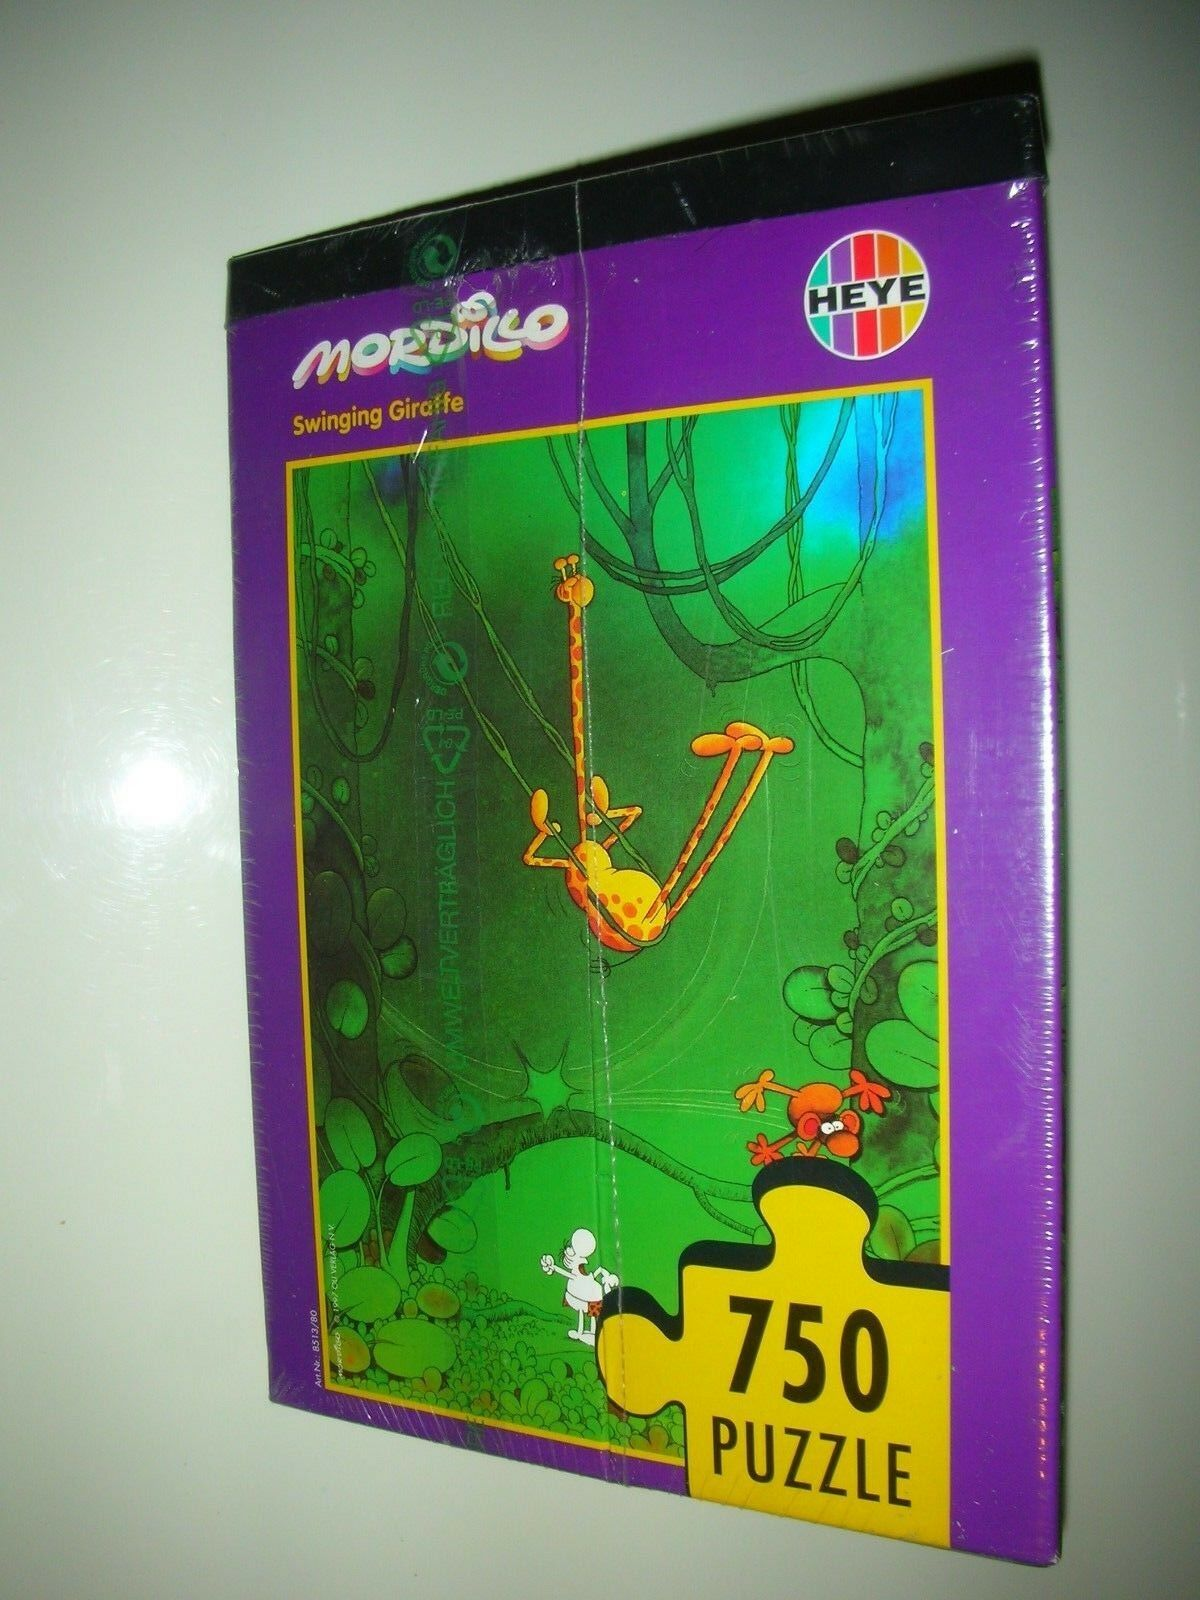 PUZZLE - MORDILLO 8513 - SWINGING GIRAFFE - 750 Pezzi - 41 x 58 - Heye - 1978